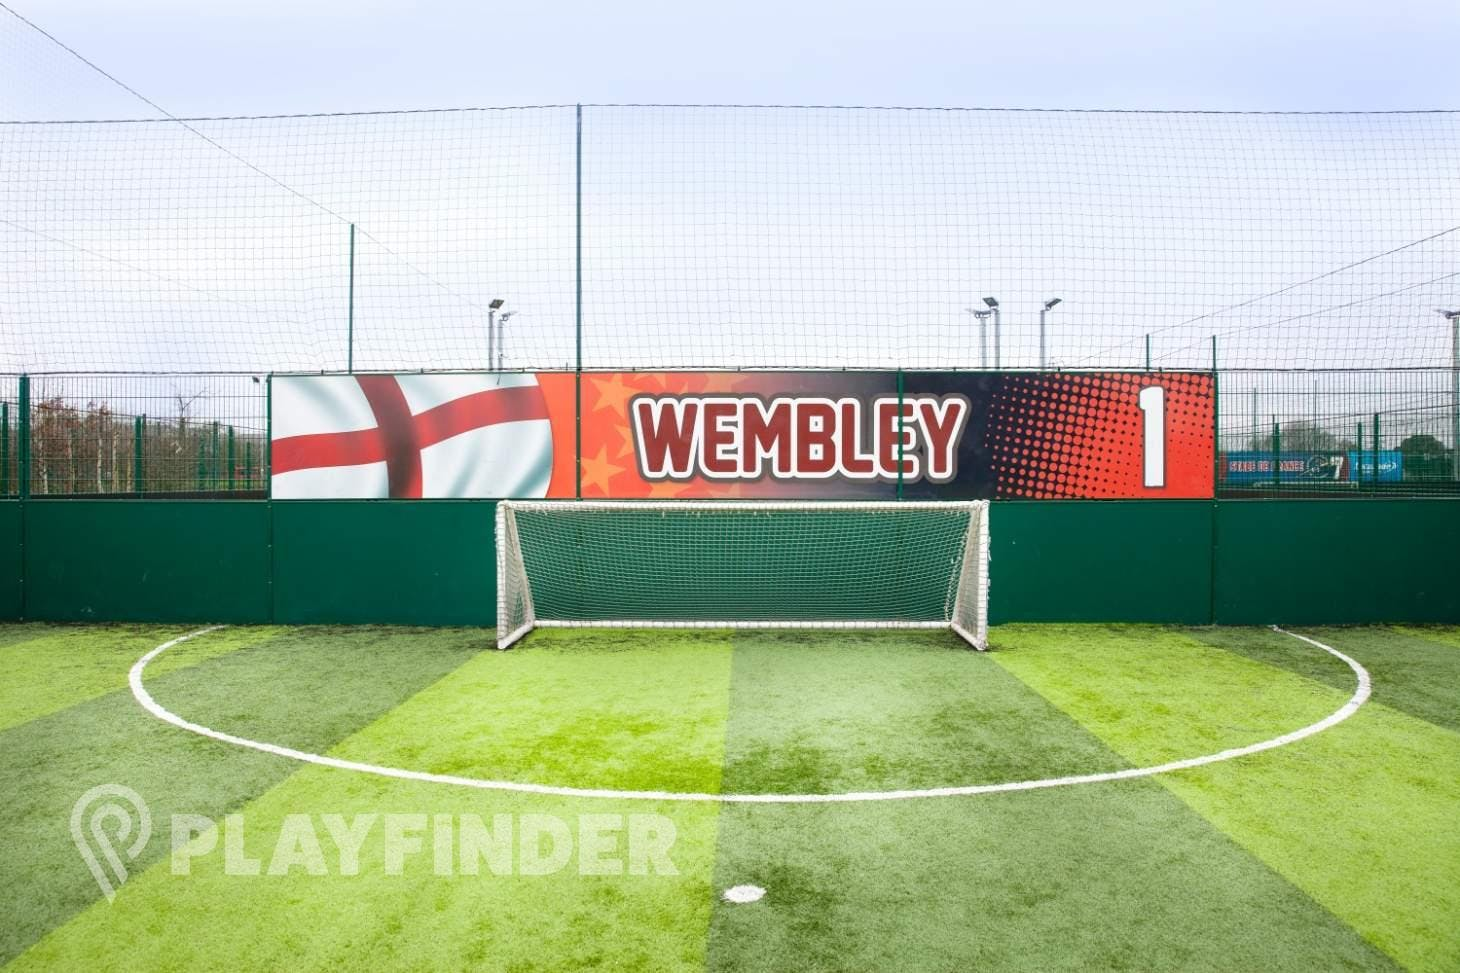 Goals Sheffield 5 a side | 3G Astroturf football pitch